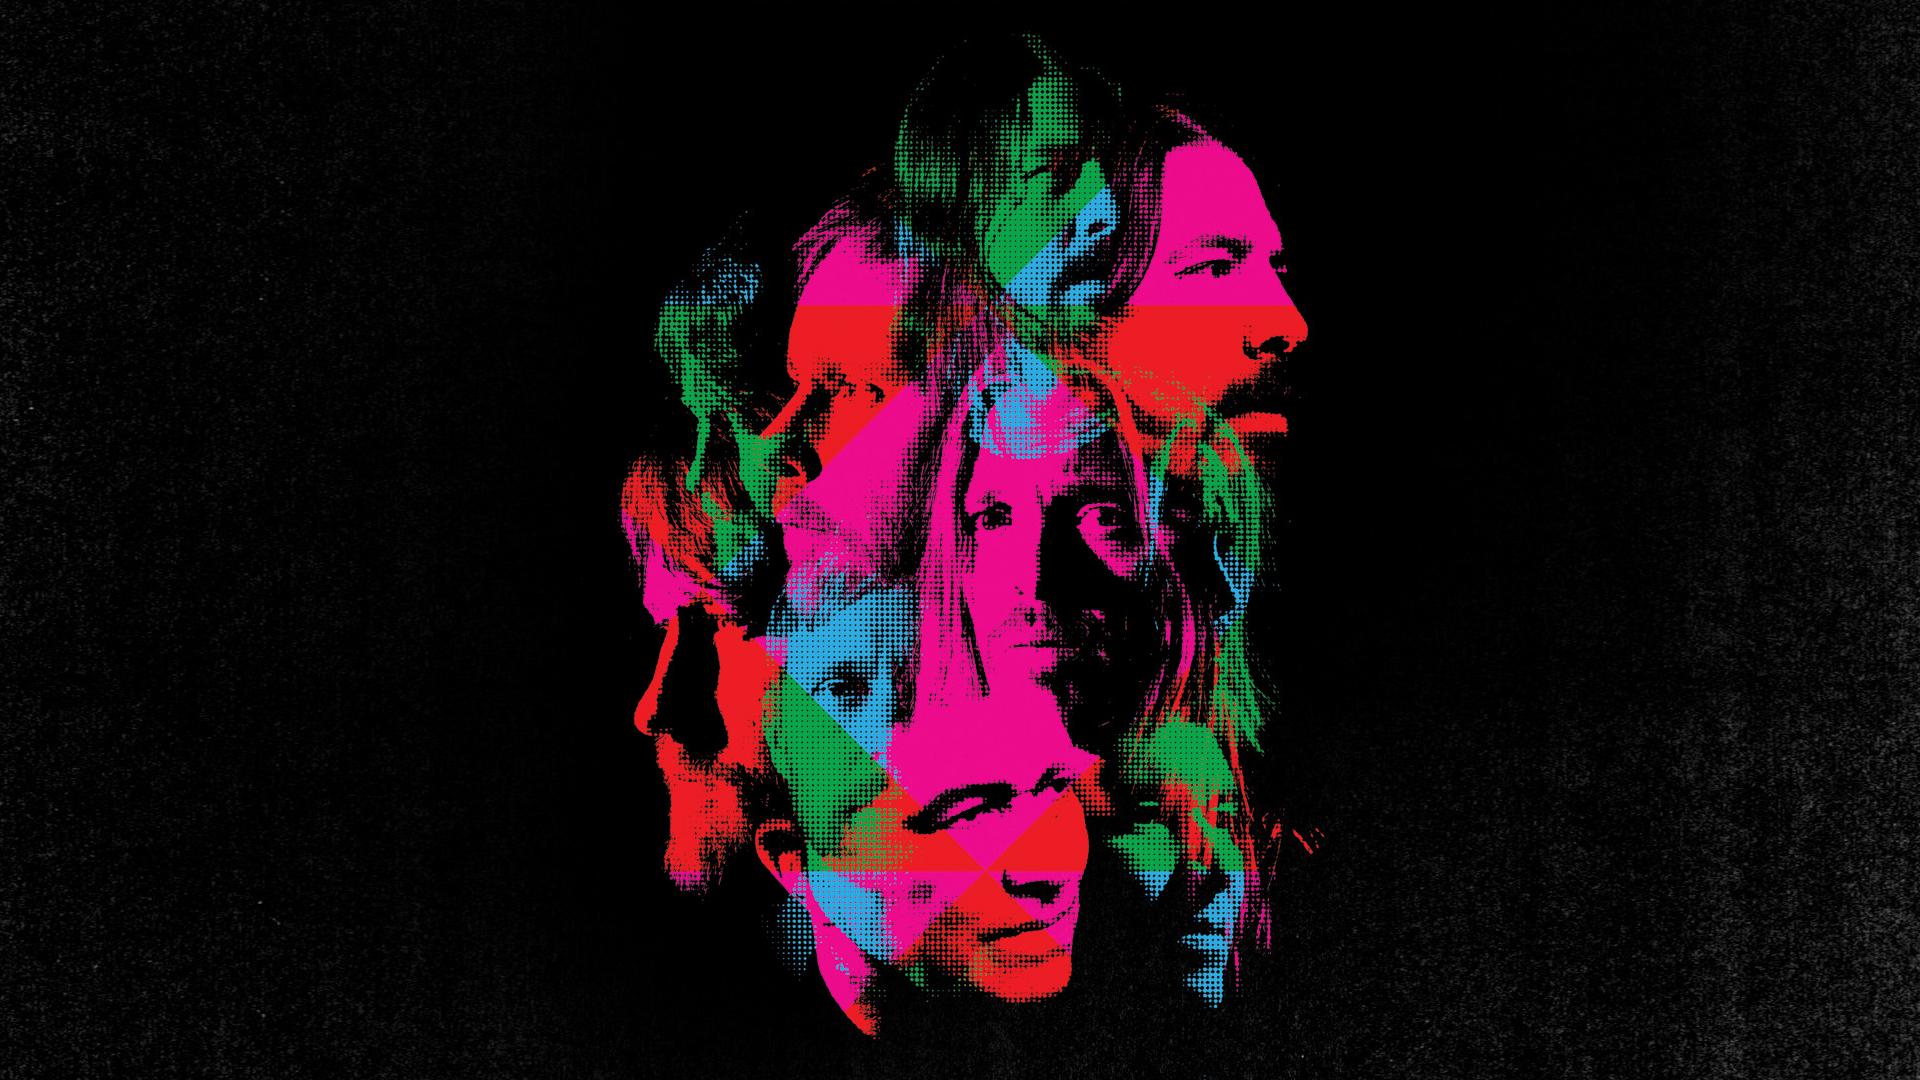 Music   Foo Fighters Wallpaper 1920x1080